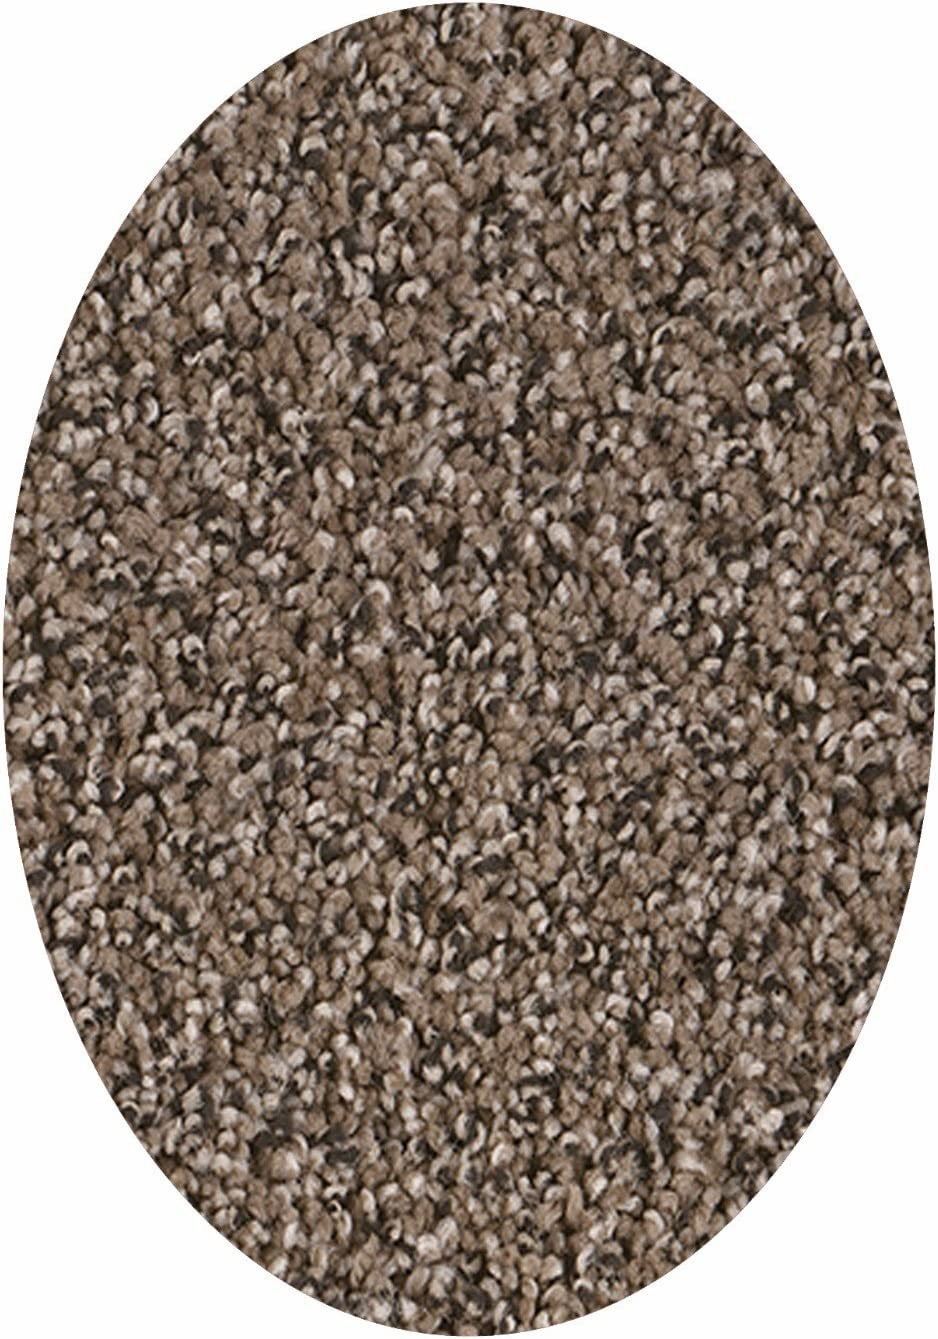 Our Pebble Beach Color Flint Oval - Area Popular Rug 12'X15' Credence